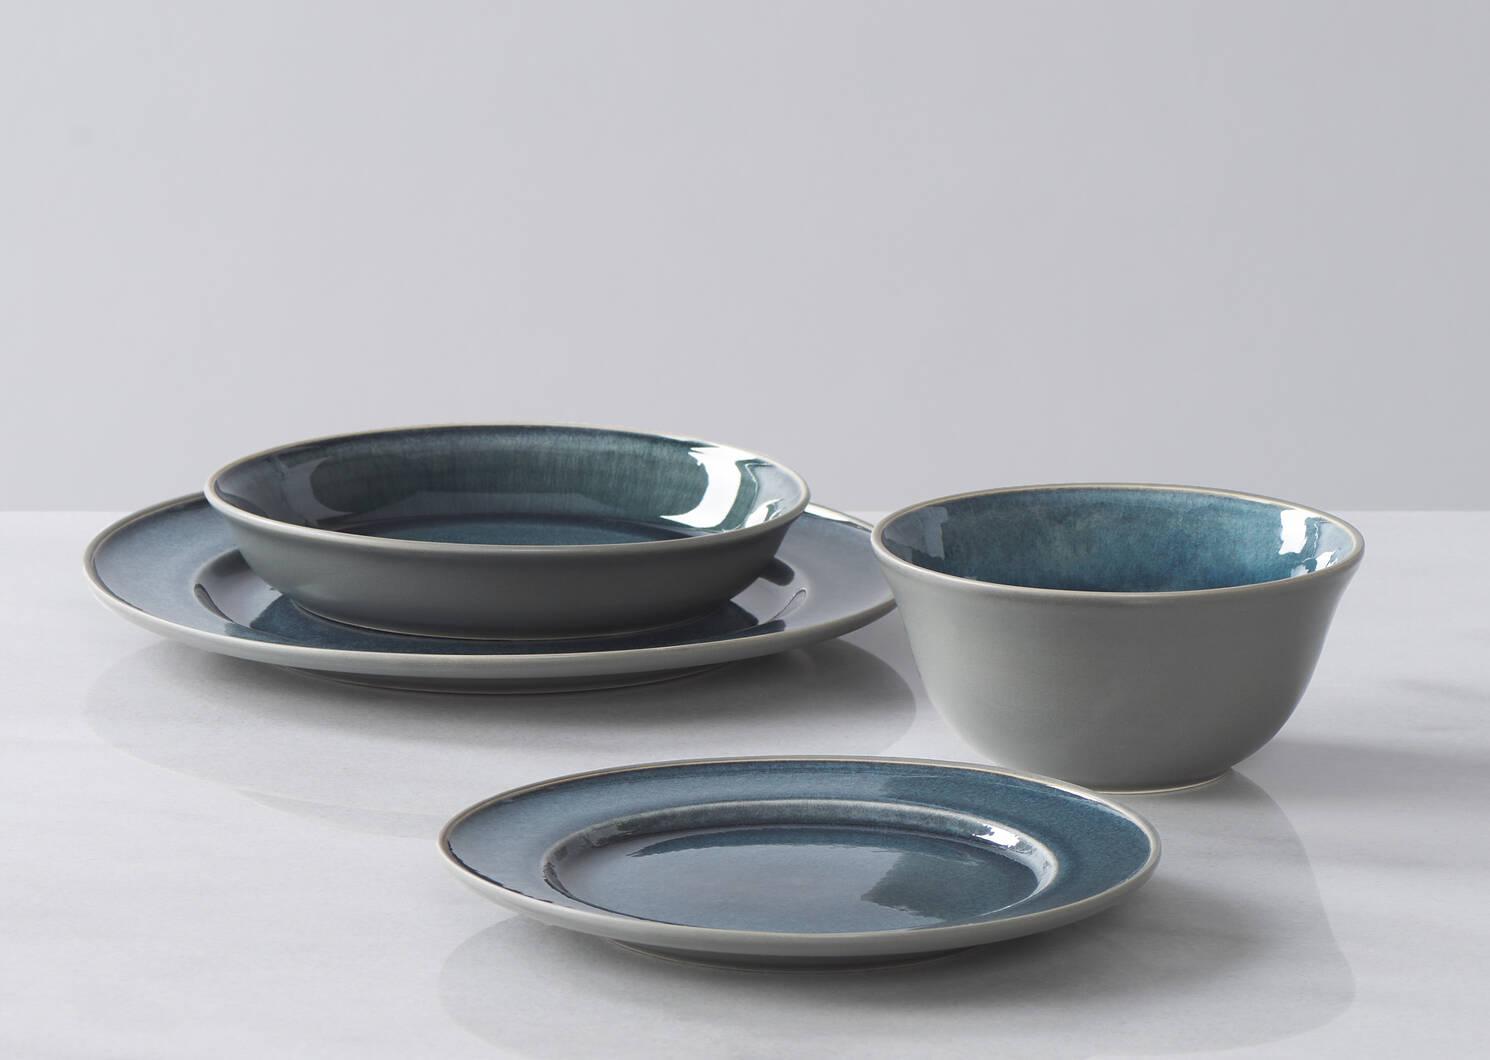 Kitsilano 16 pc Dish Set Blue